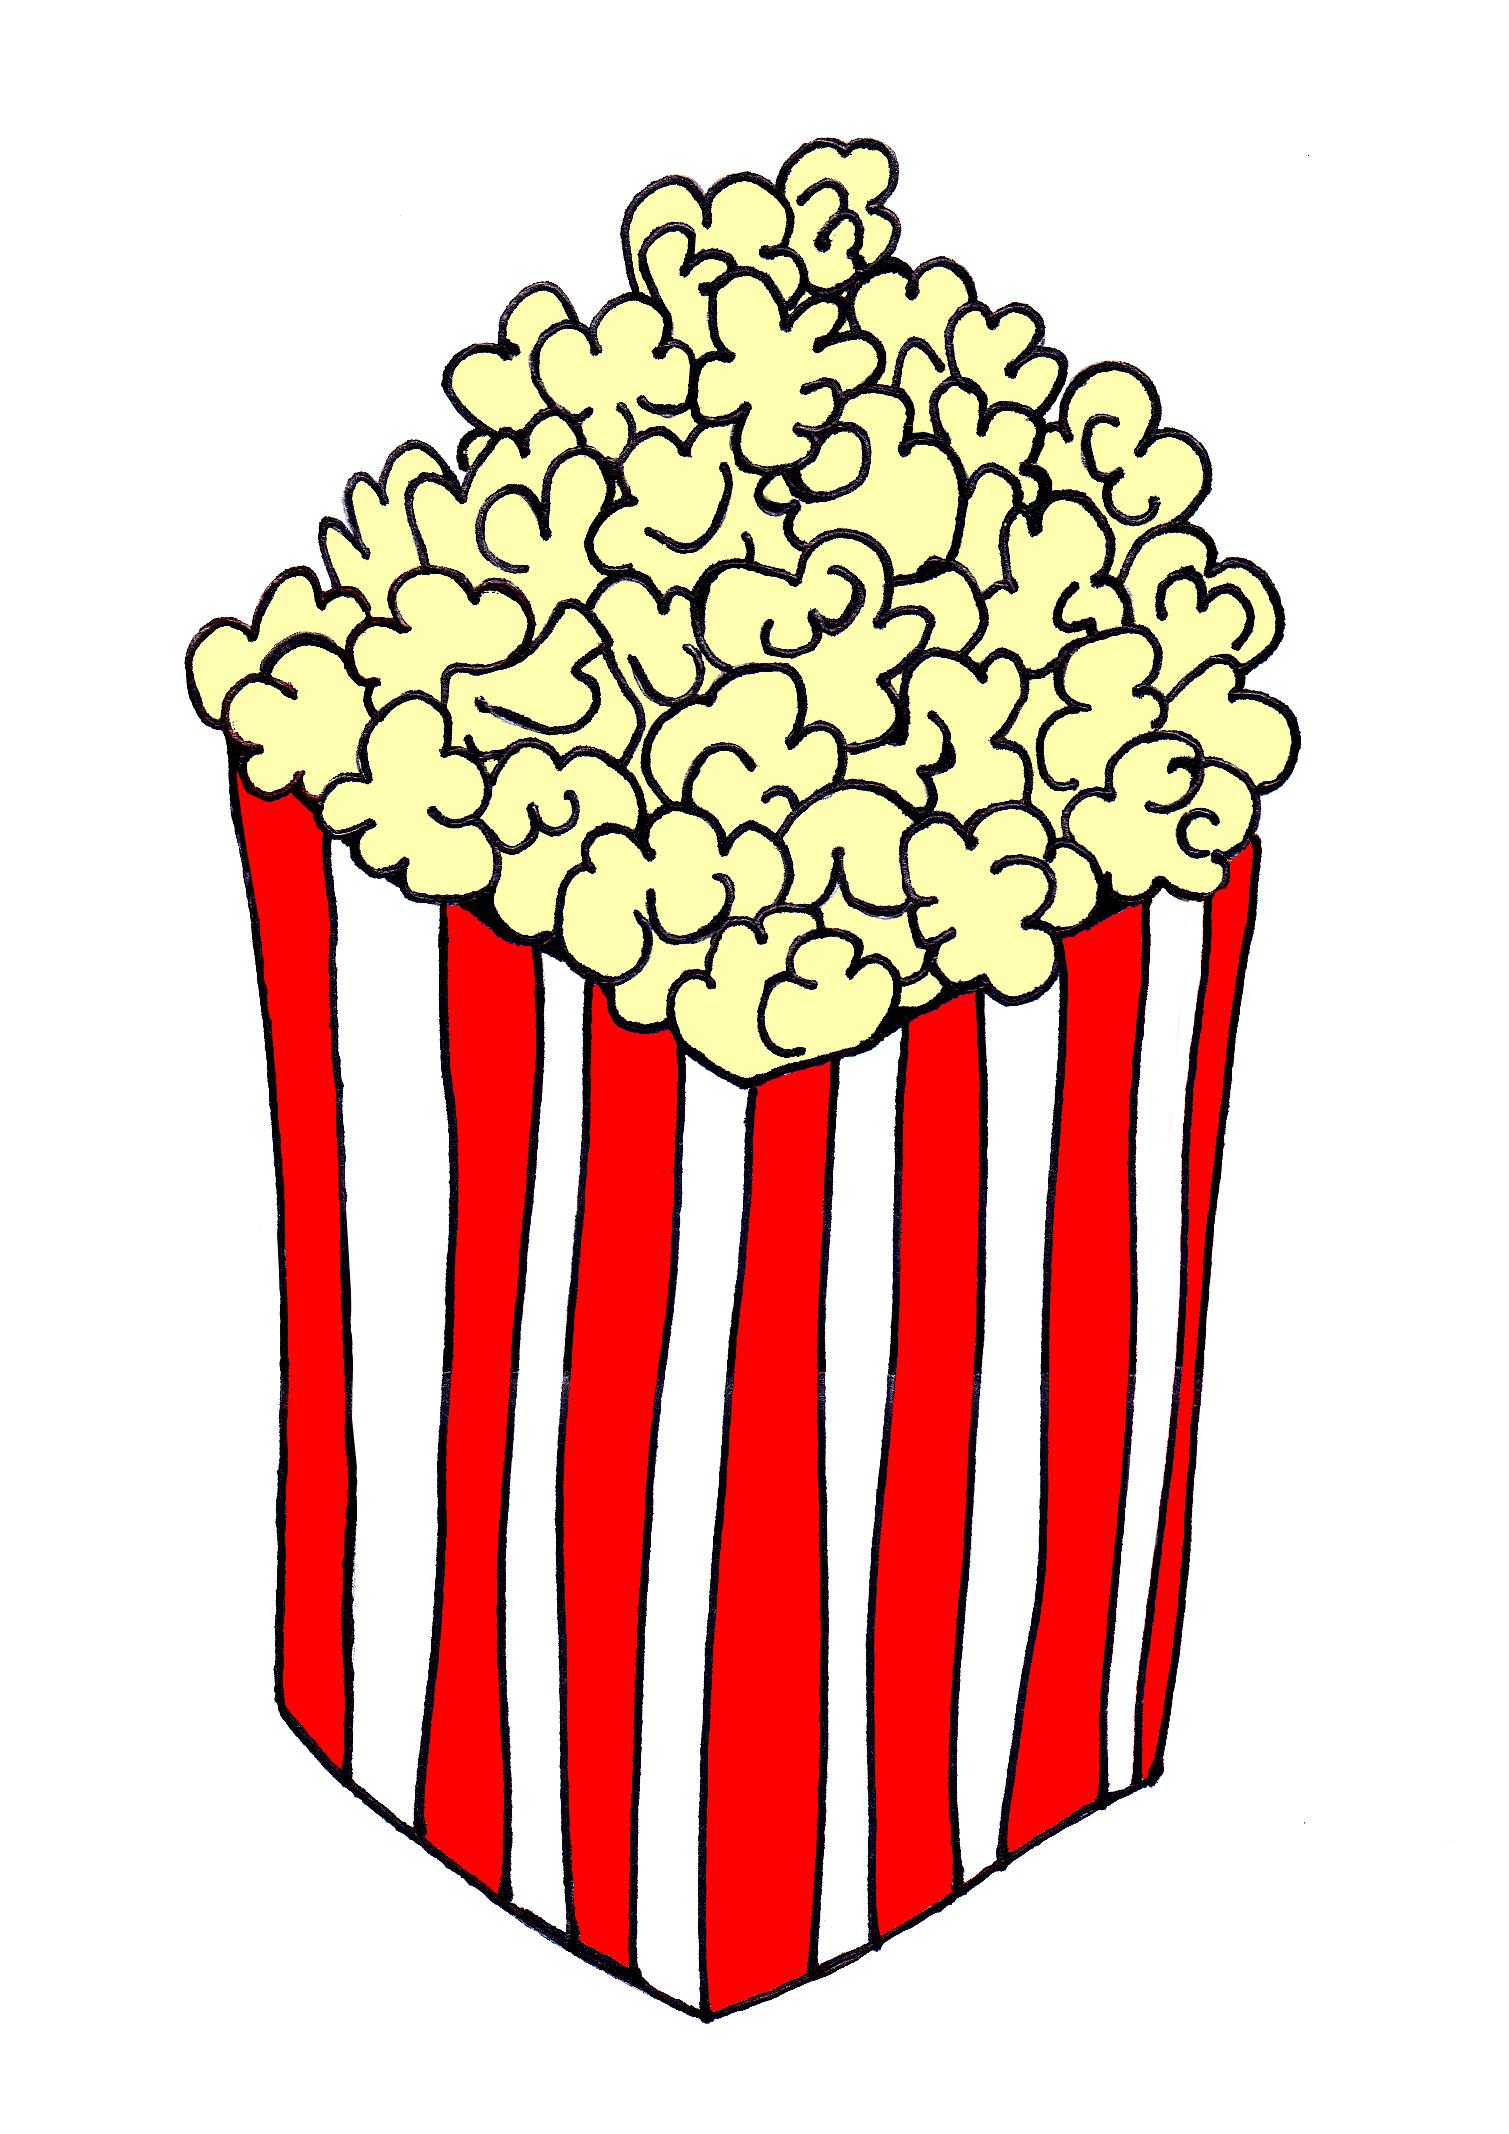 Popcorn Kernel Icon Popcorn icon